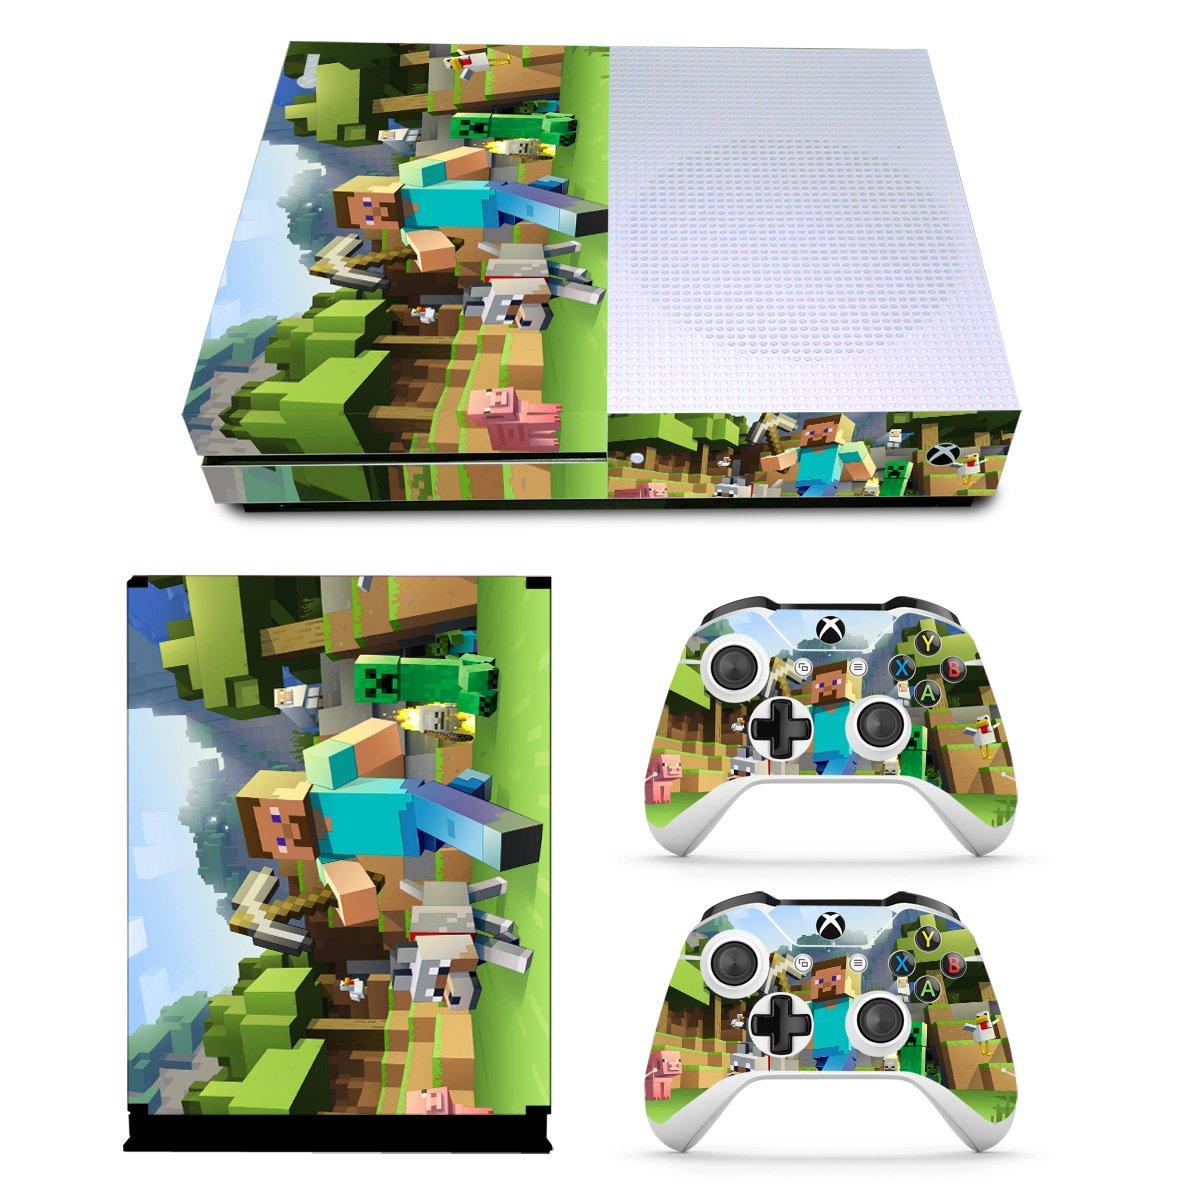 EBTY-Dreams Inc. - Microsoft Xbox One Slim - Mine Video Game Vinyl Skin Sticker Decal Protector